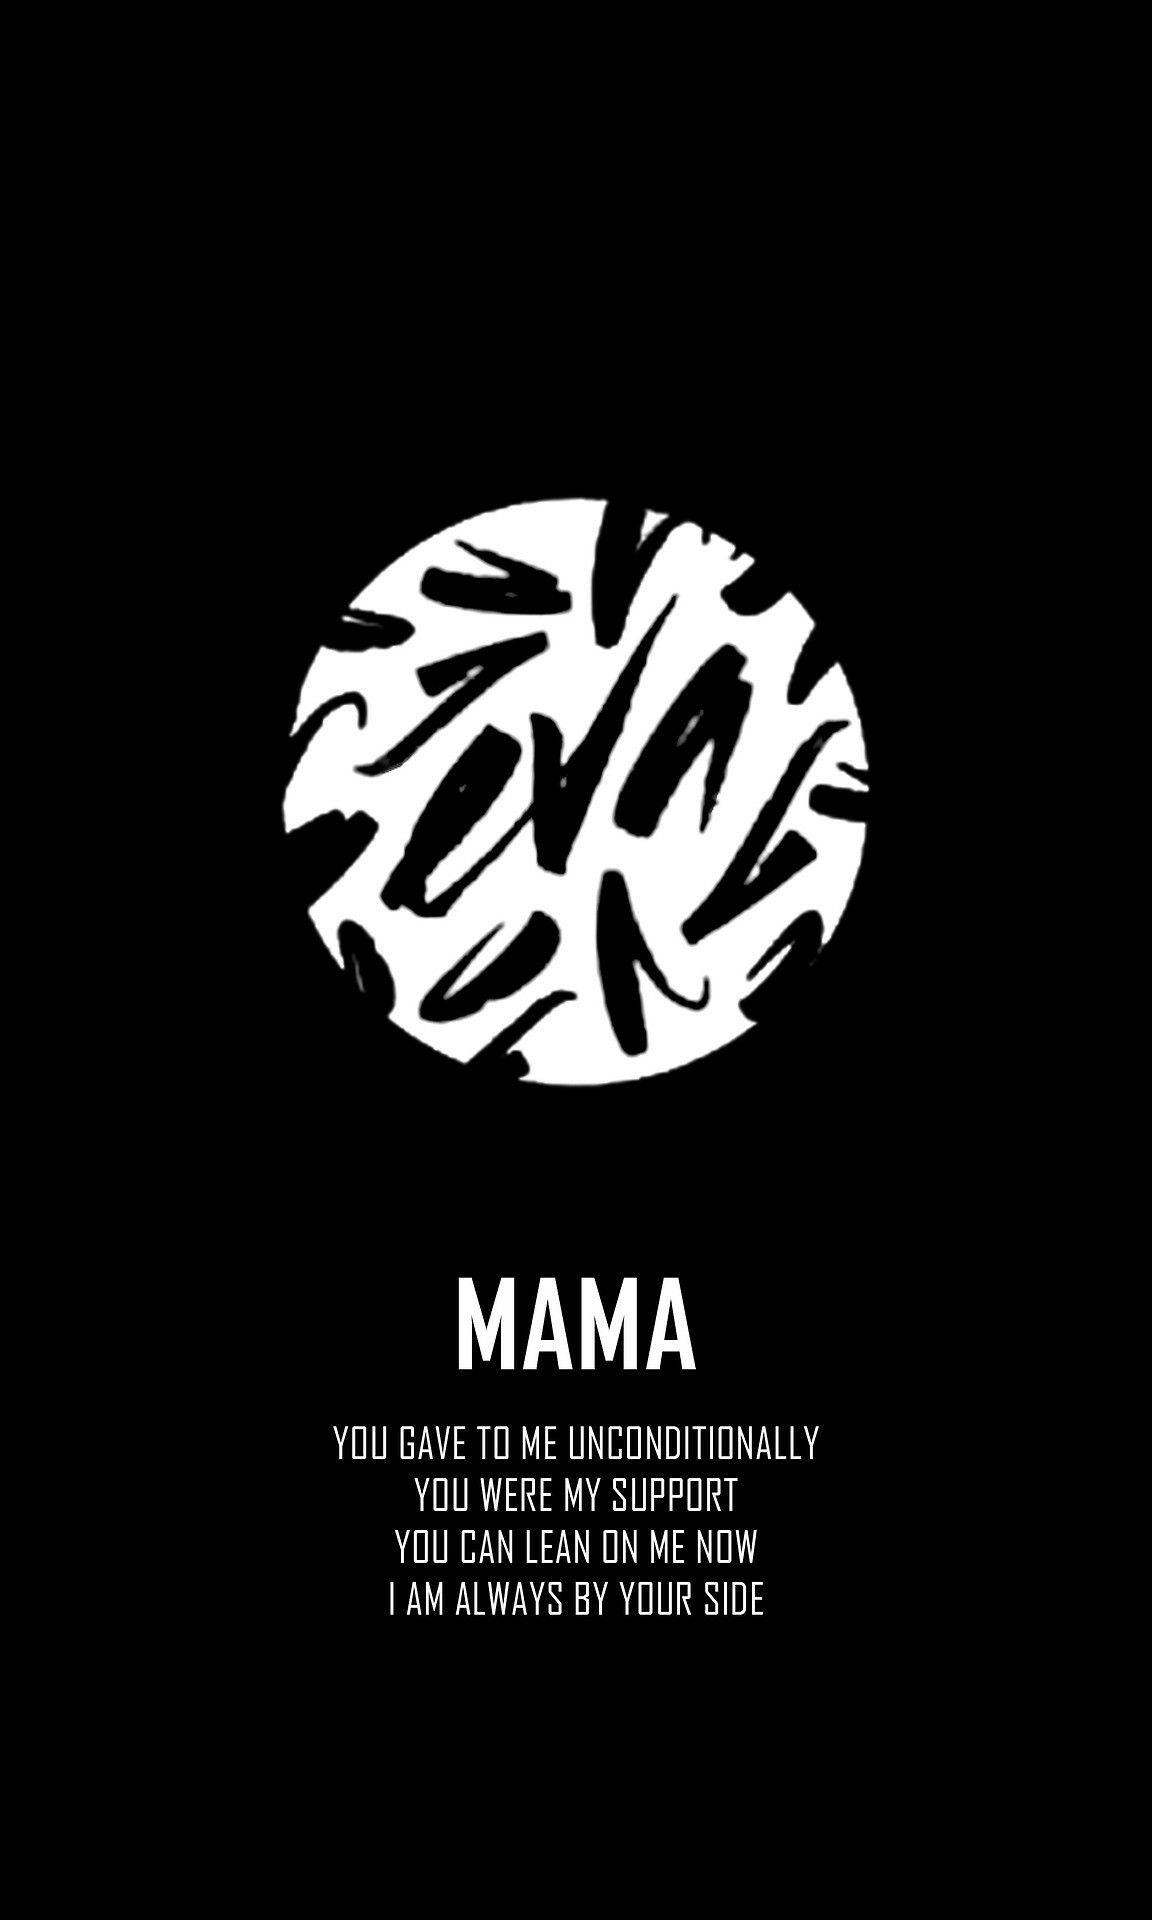 Bts Wings Short Film Logo Mama Wallpaper Bts Wings Aesthetic